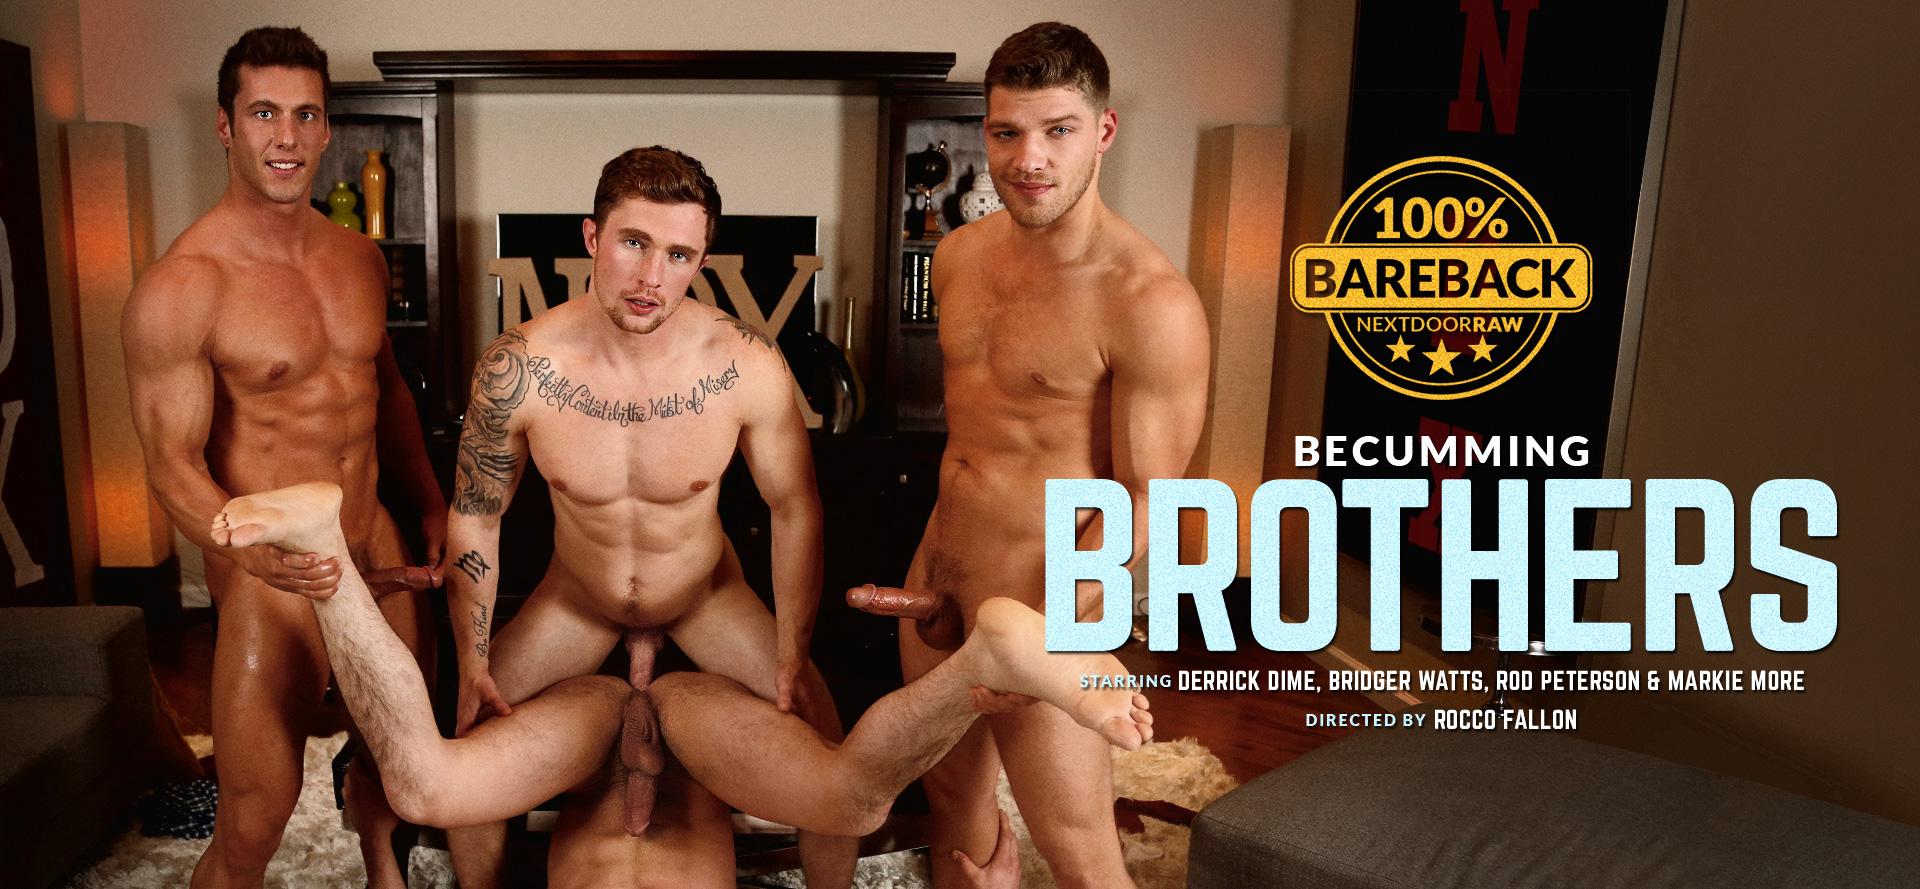 Derrick Dime, Bridger Watts, Rod Peterson, Markie More in Becumming Brothers